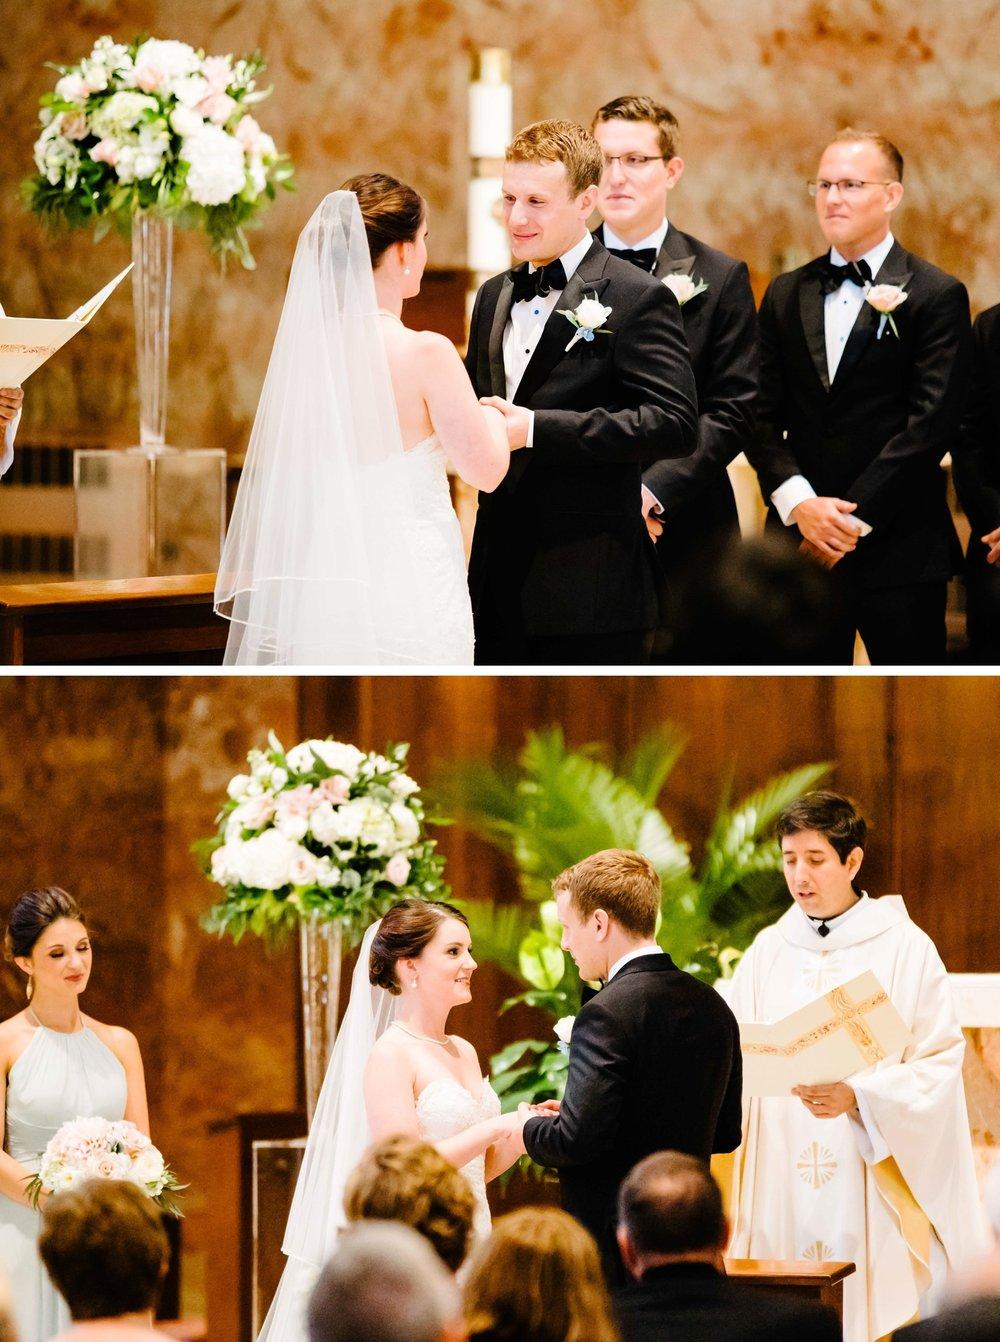 chicago-fine-art-wedding-photography-kinn30